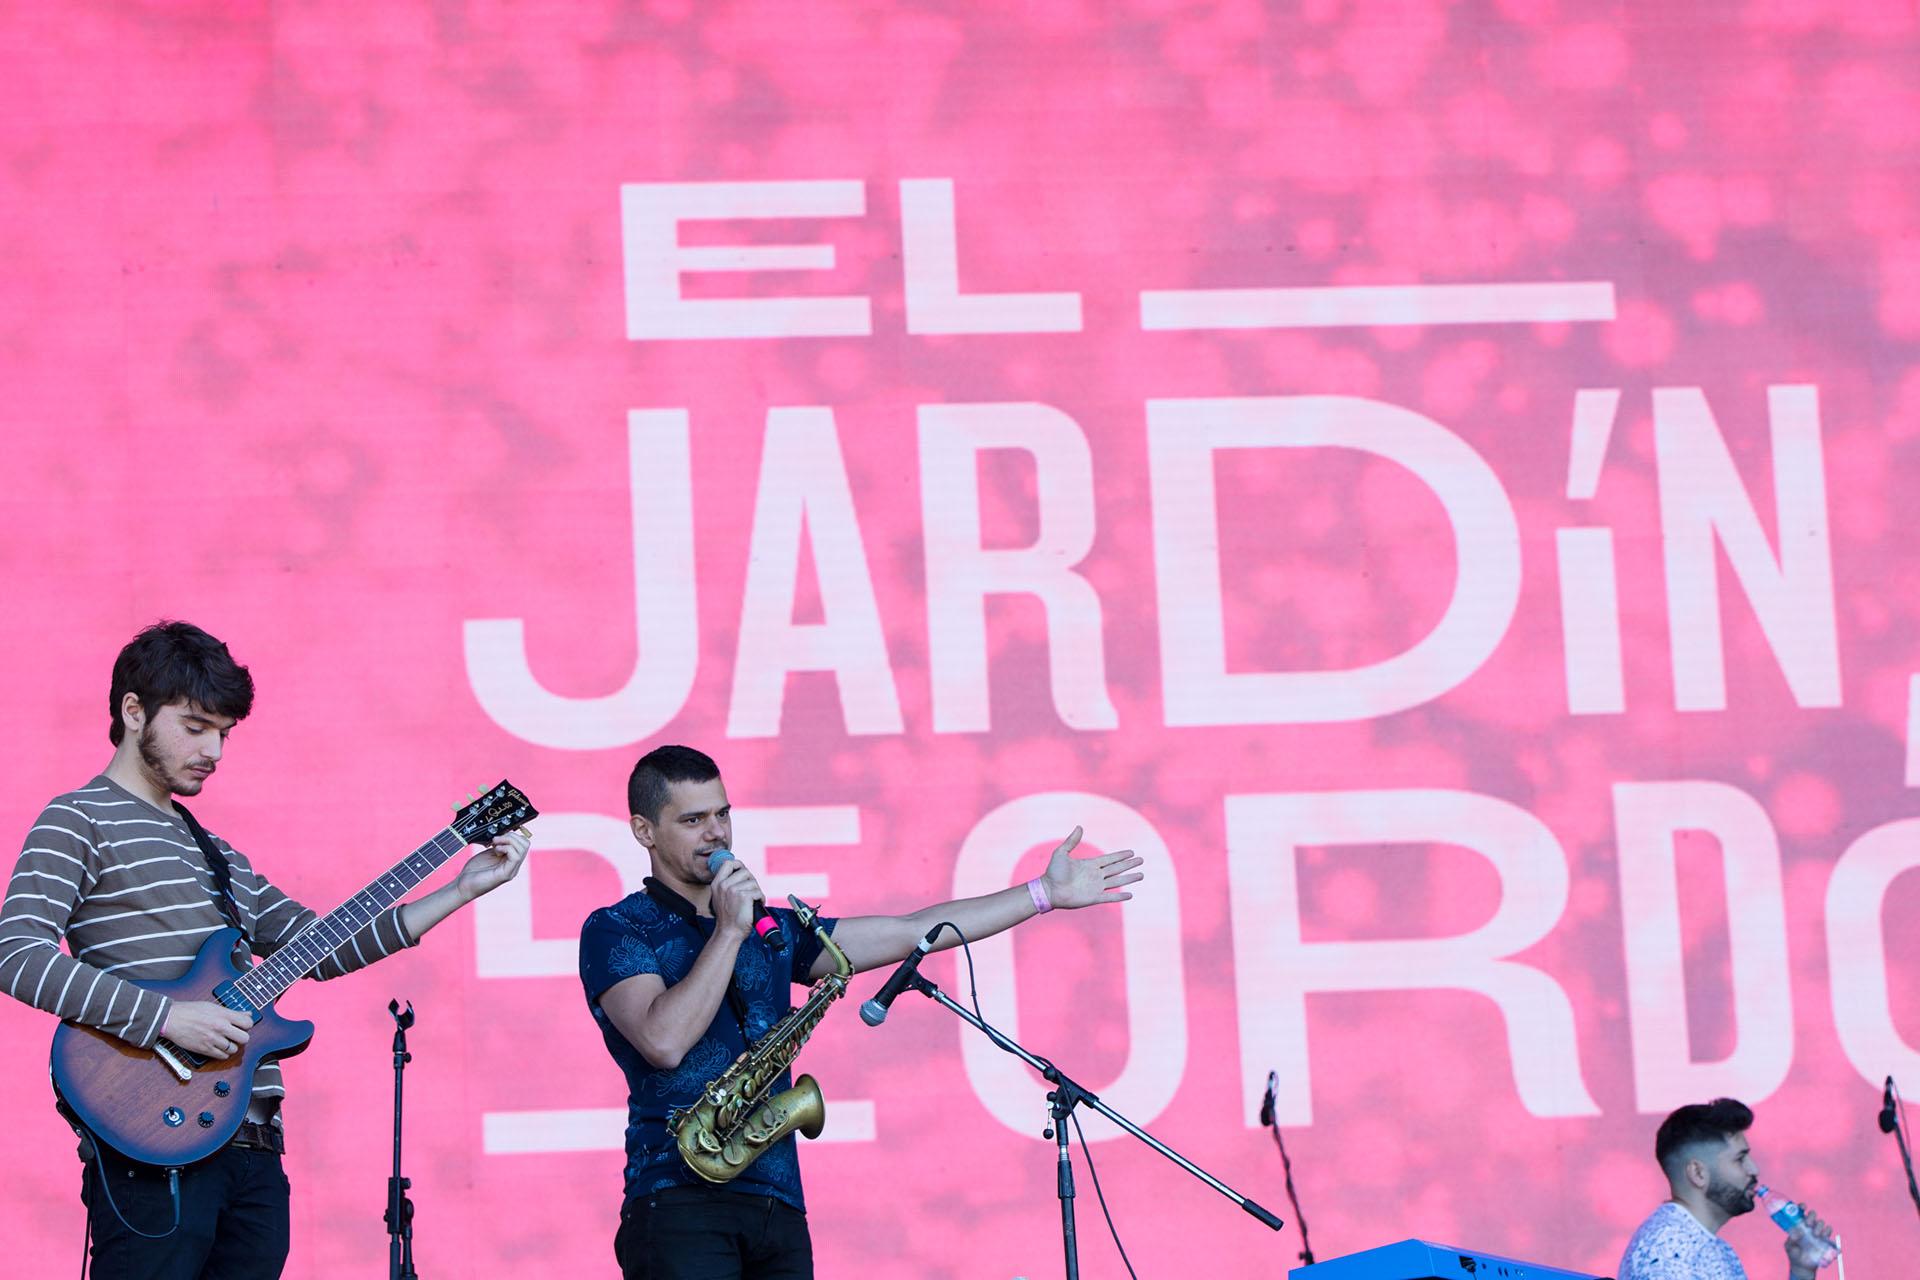 El jardín de Ordóñez en Lollapalooza 2018